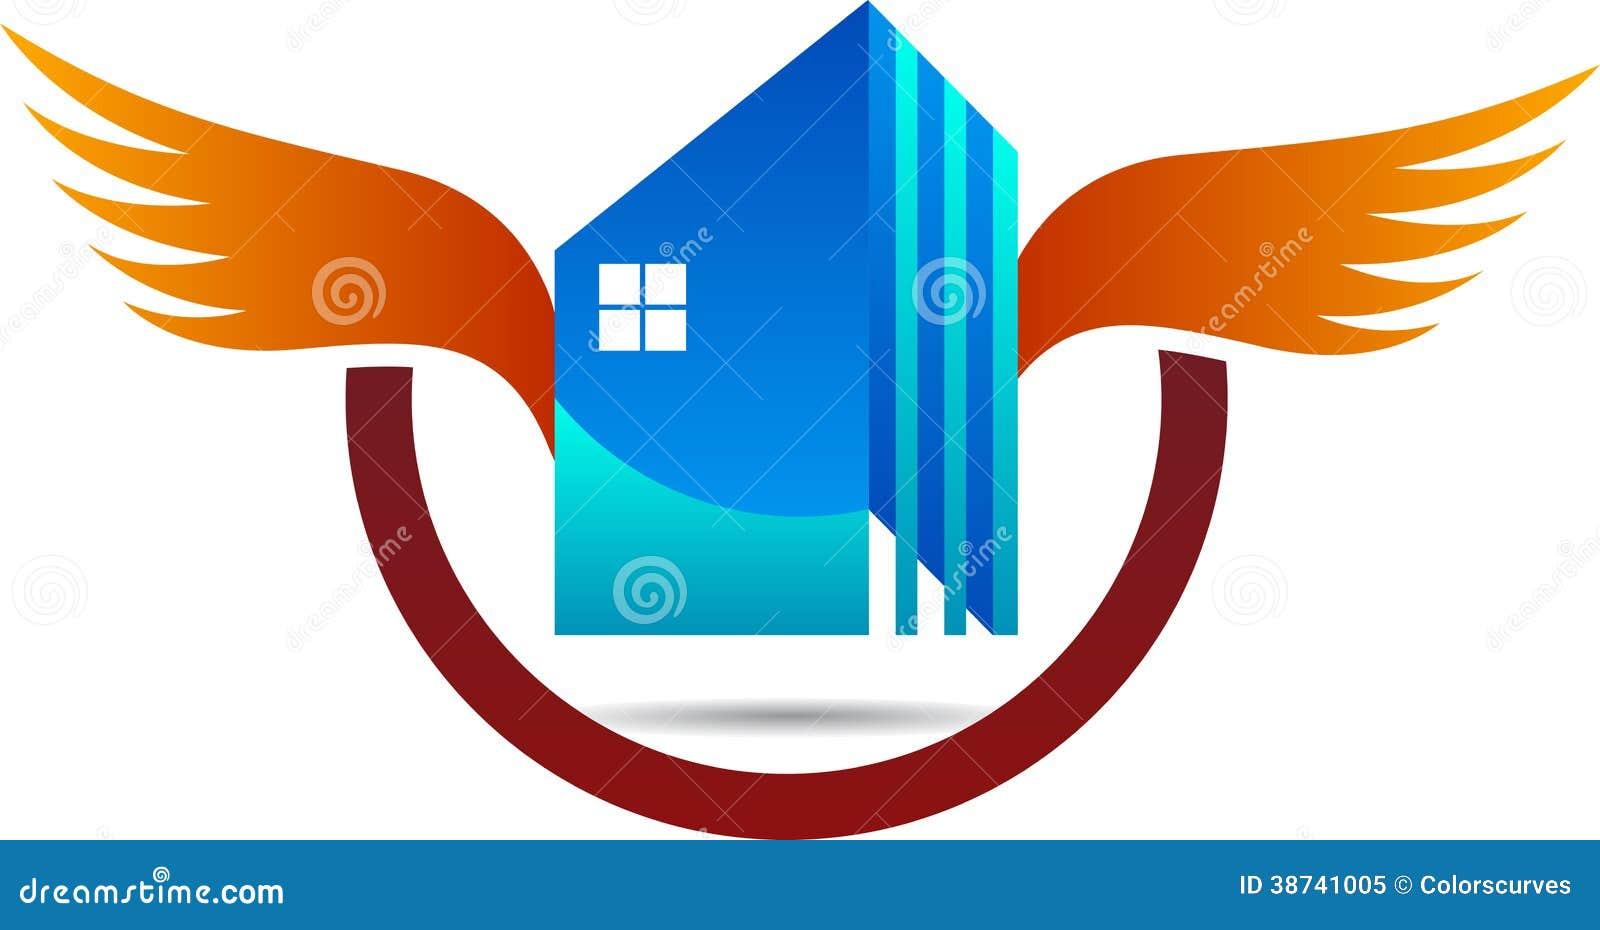 Real Estate Logo Royalty Free Stock Photo - Image: 38741005